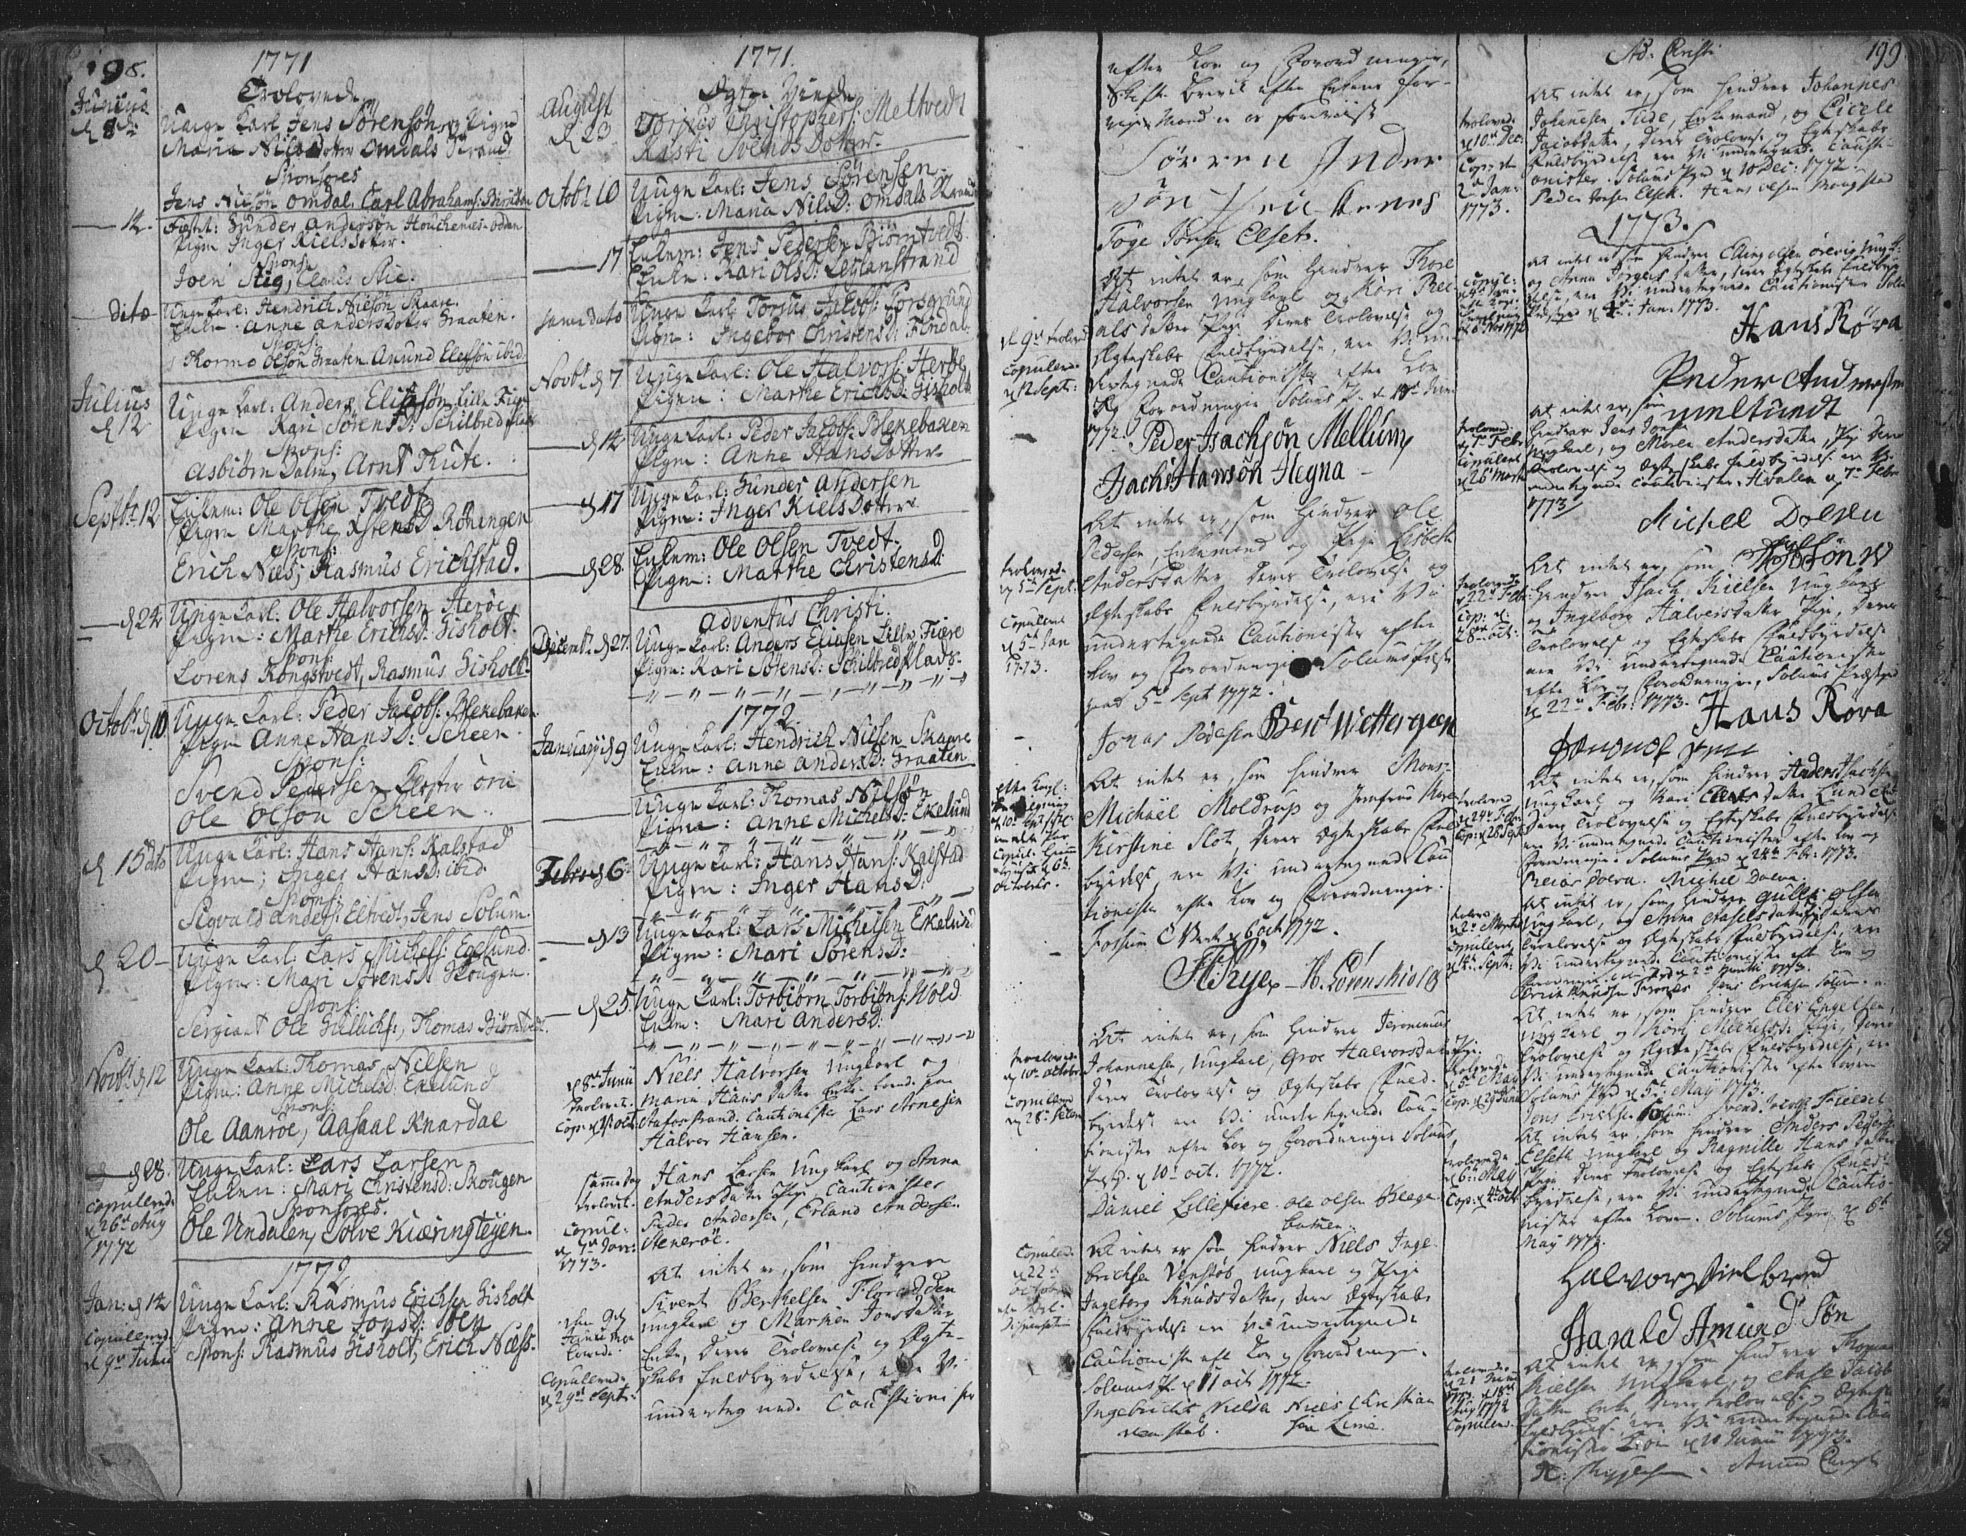 SAKO, Solum kirkebøker, F/Fa/L0003: Ministerialbok nr. I 3, 1761-1814, s. 198-199